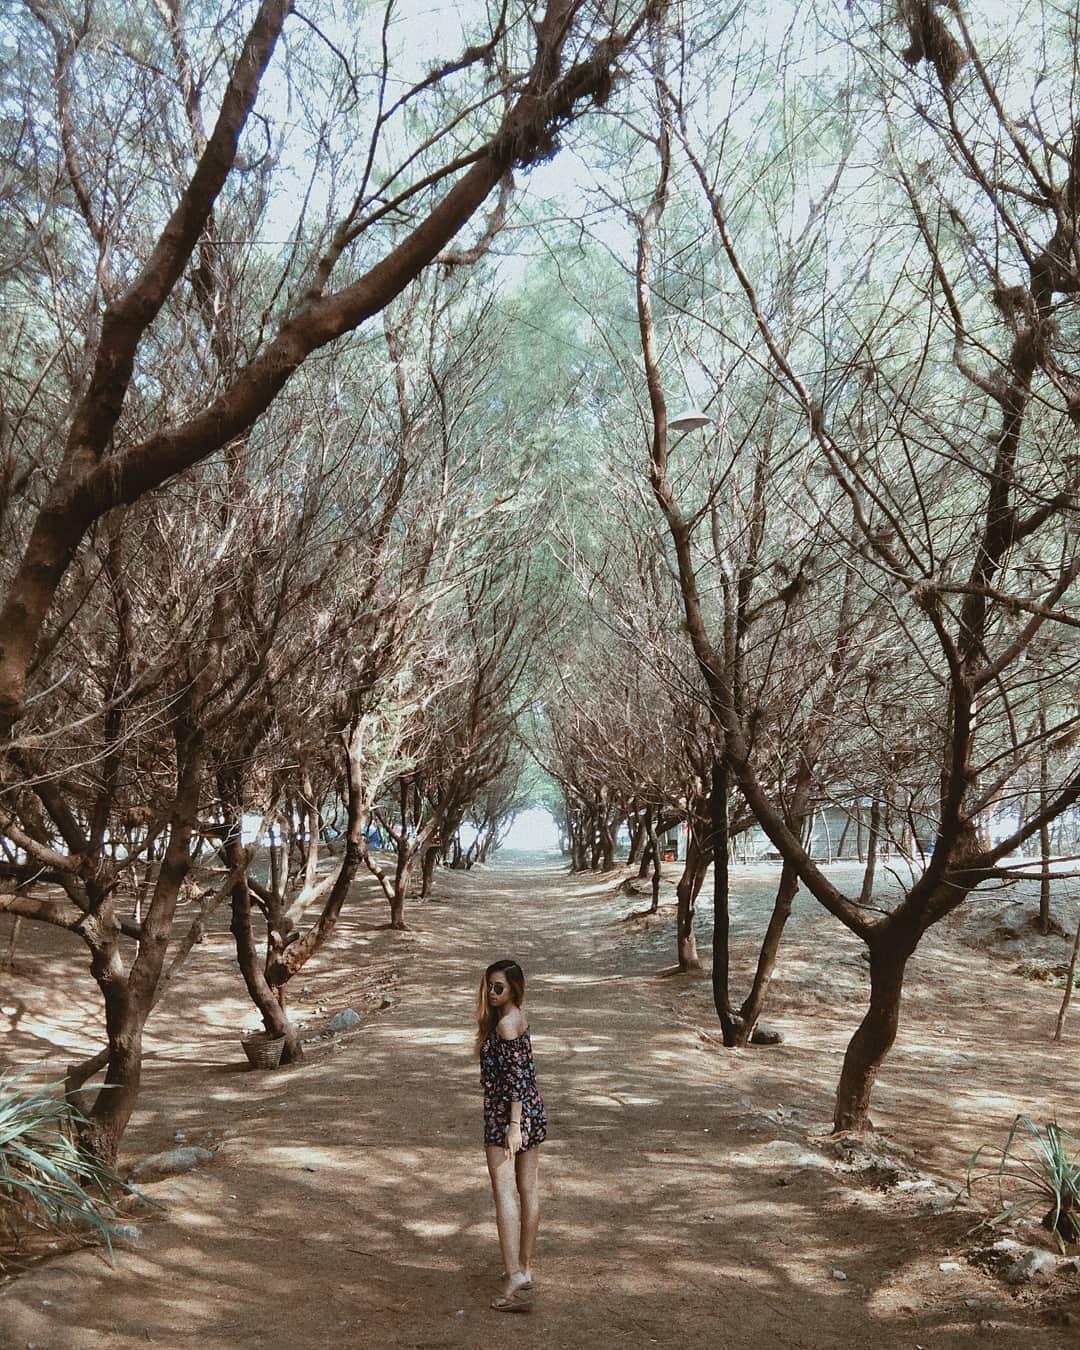 Pantai Cemoro Sewu, Pantai Eksotis Jogja dengan Jejeran Pohon Cemara